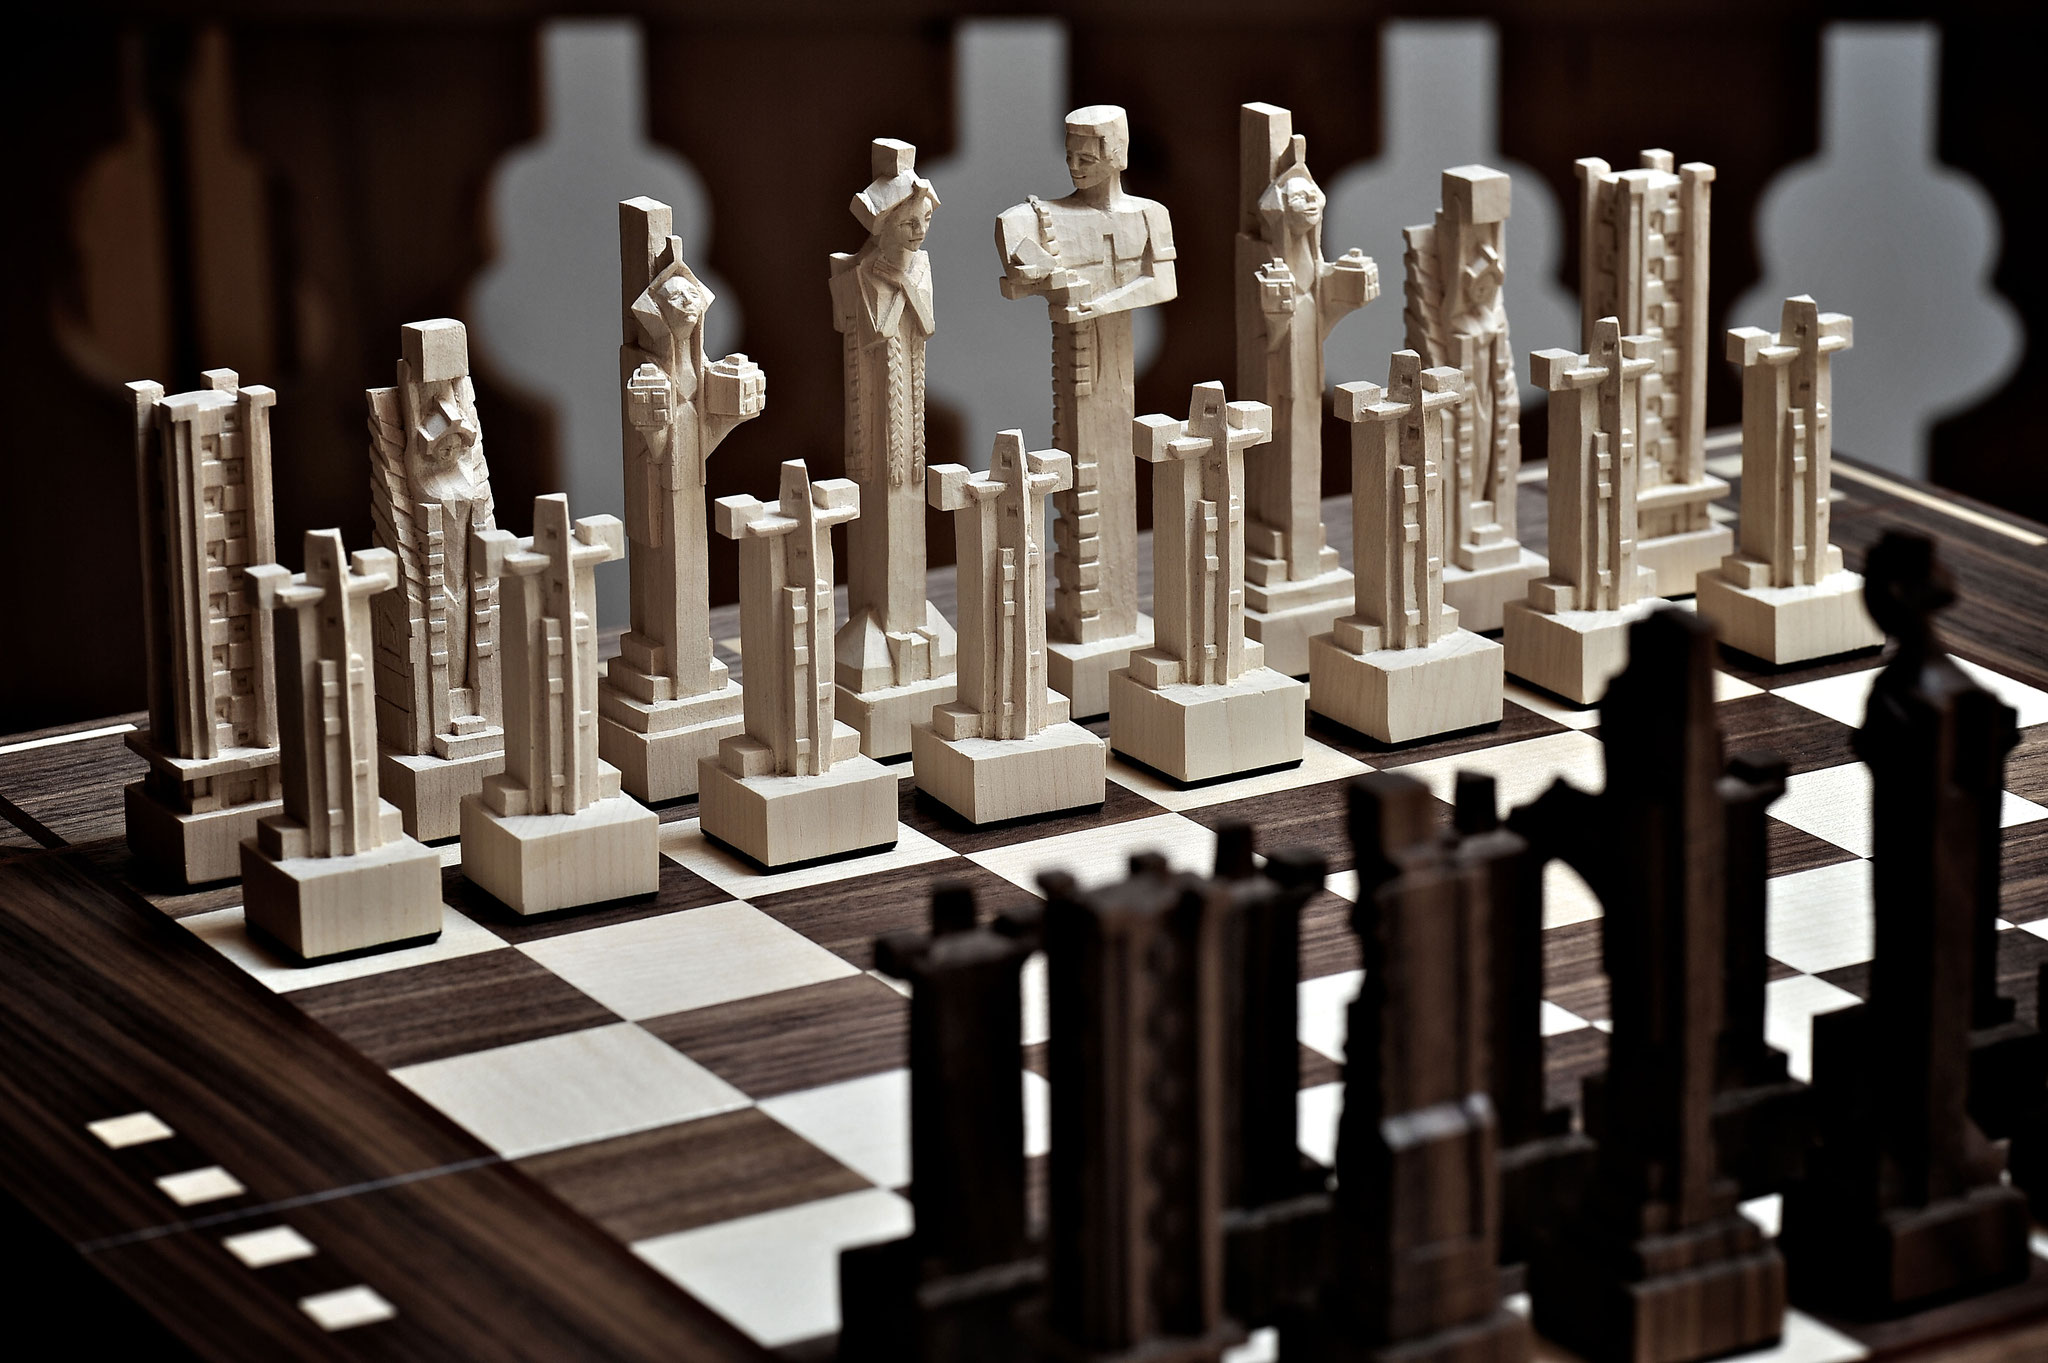 Schachfiguren handgeschnitzt, Schachbrett handgemacht